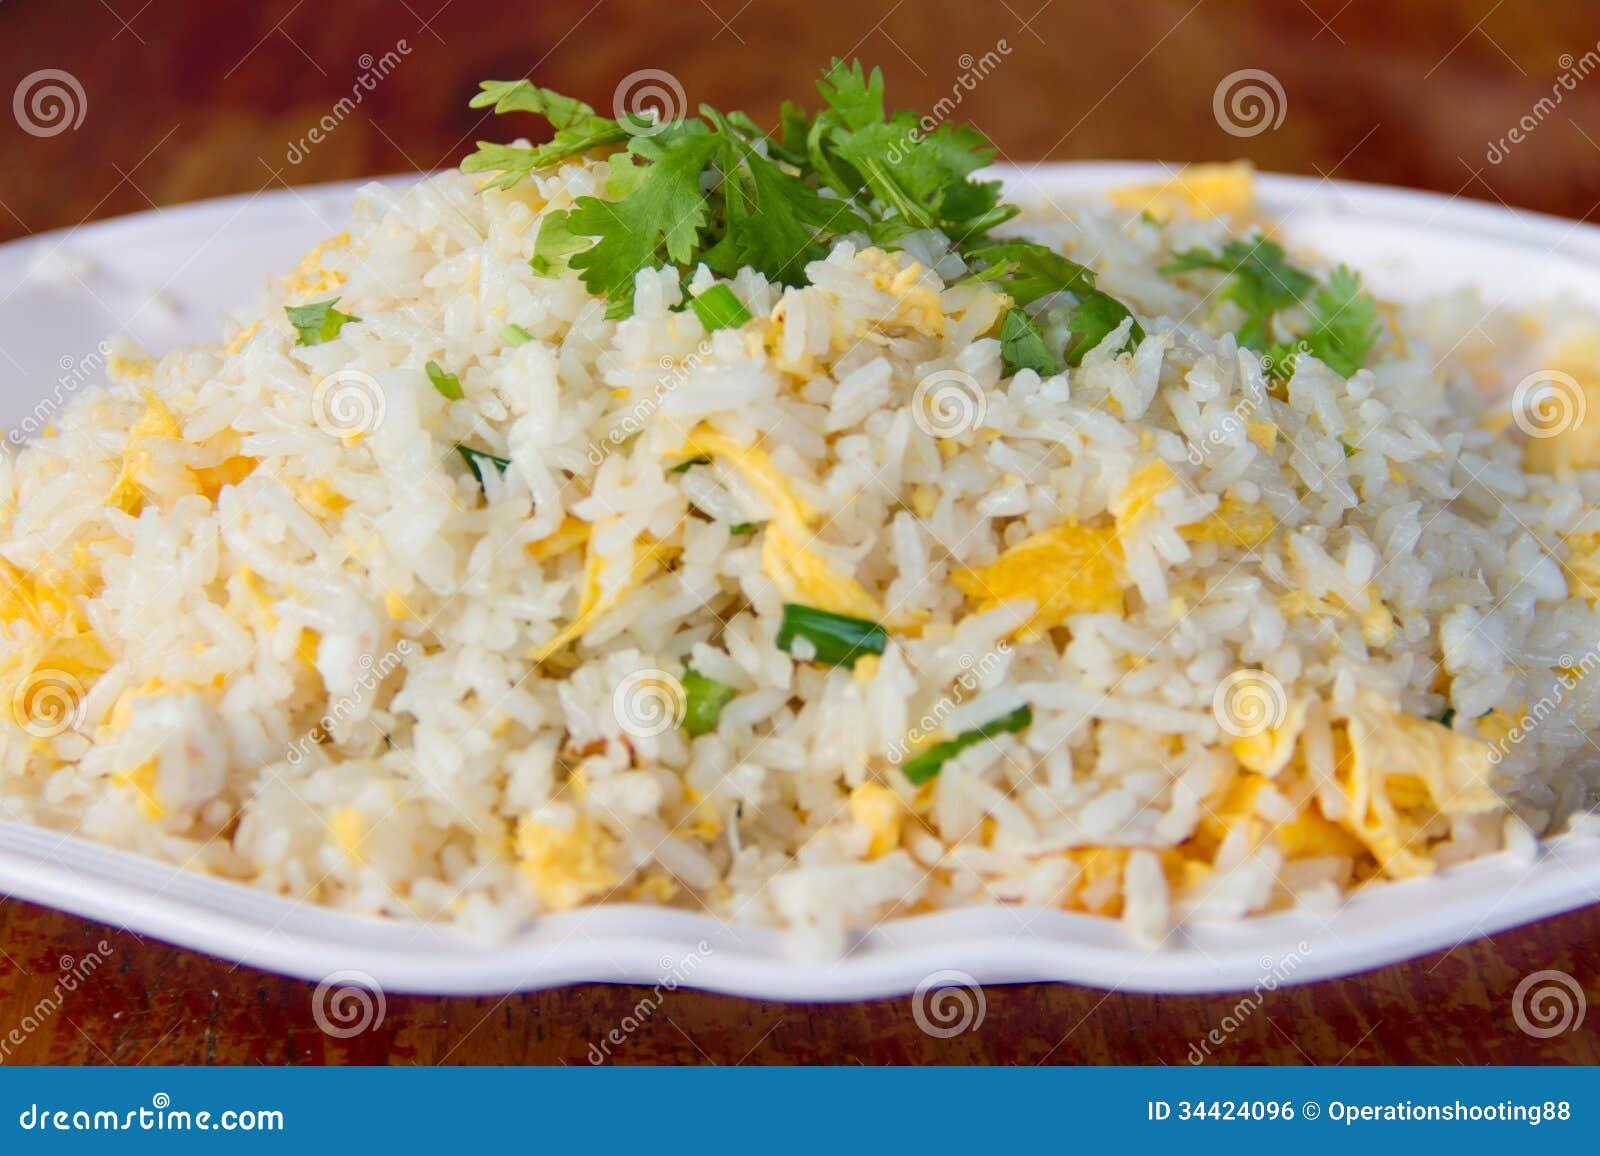 Fried Rice Royalty Free Stock Image - Image: 34424096